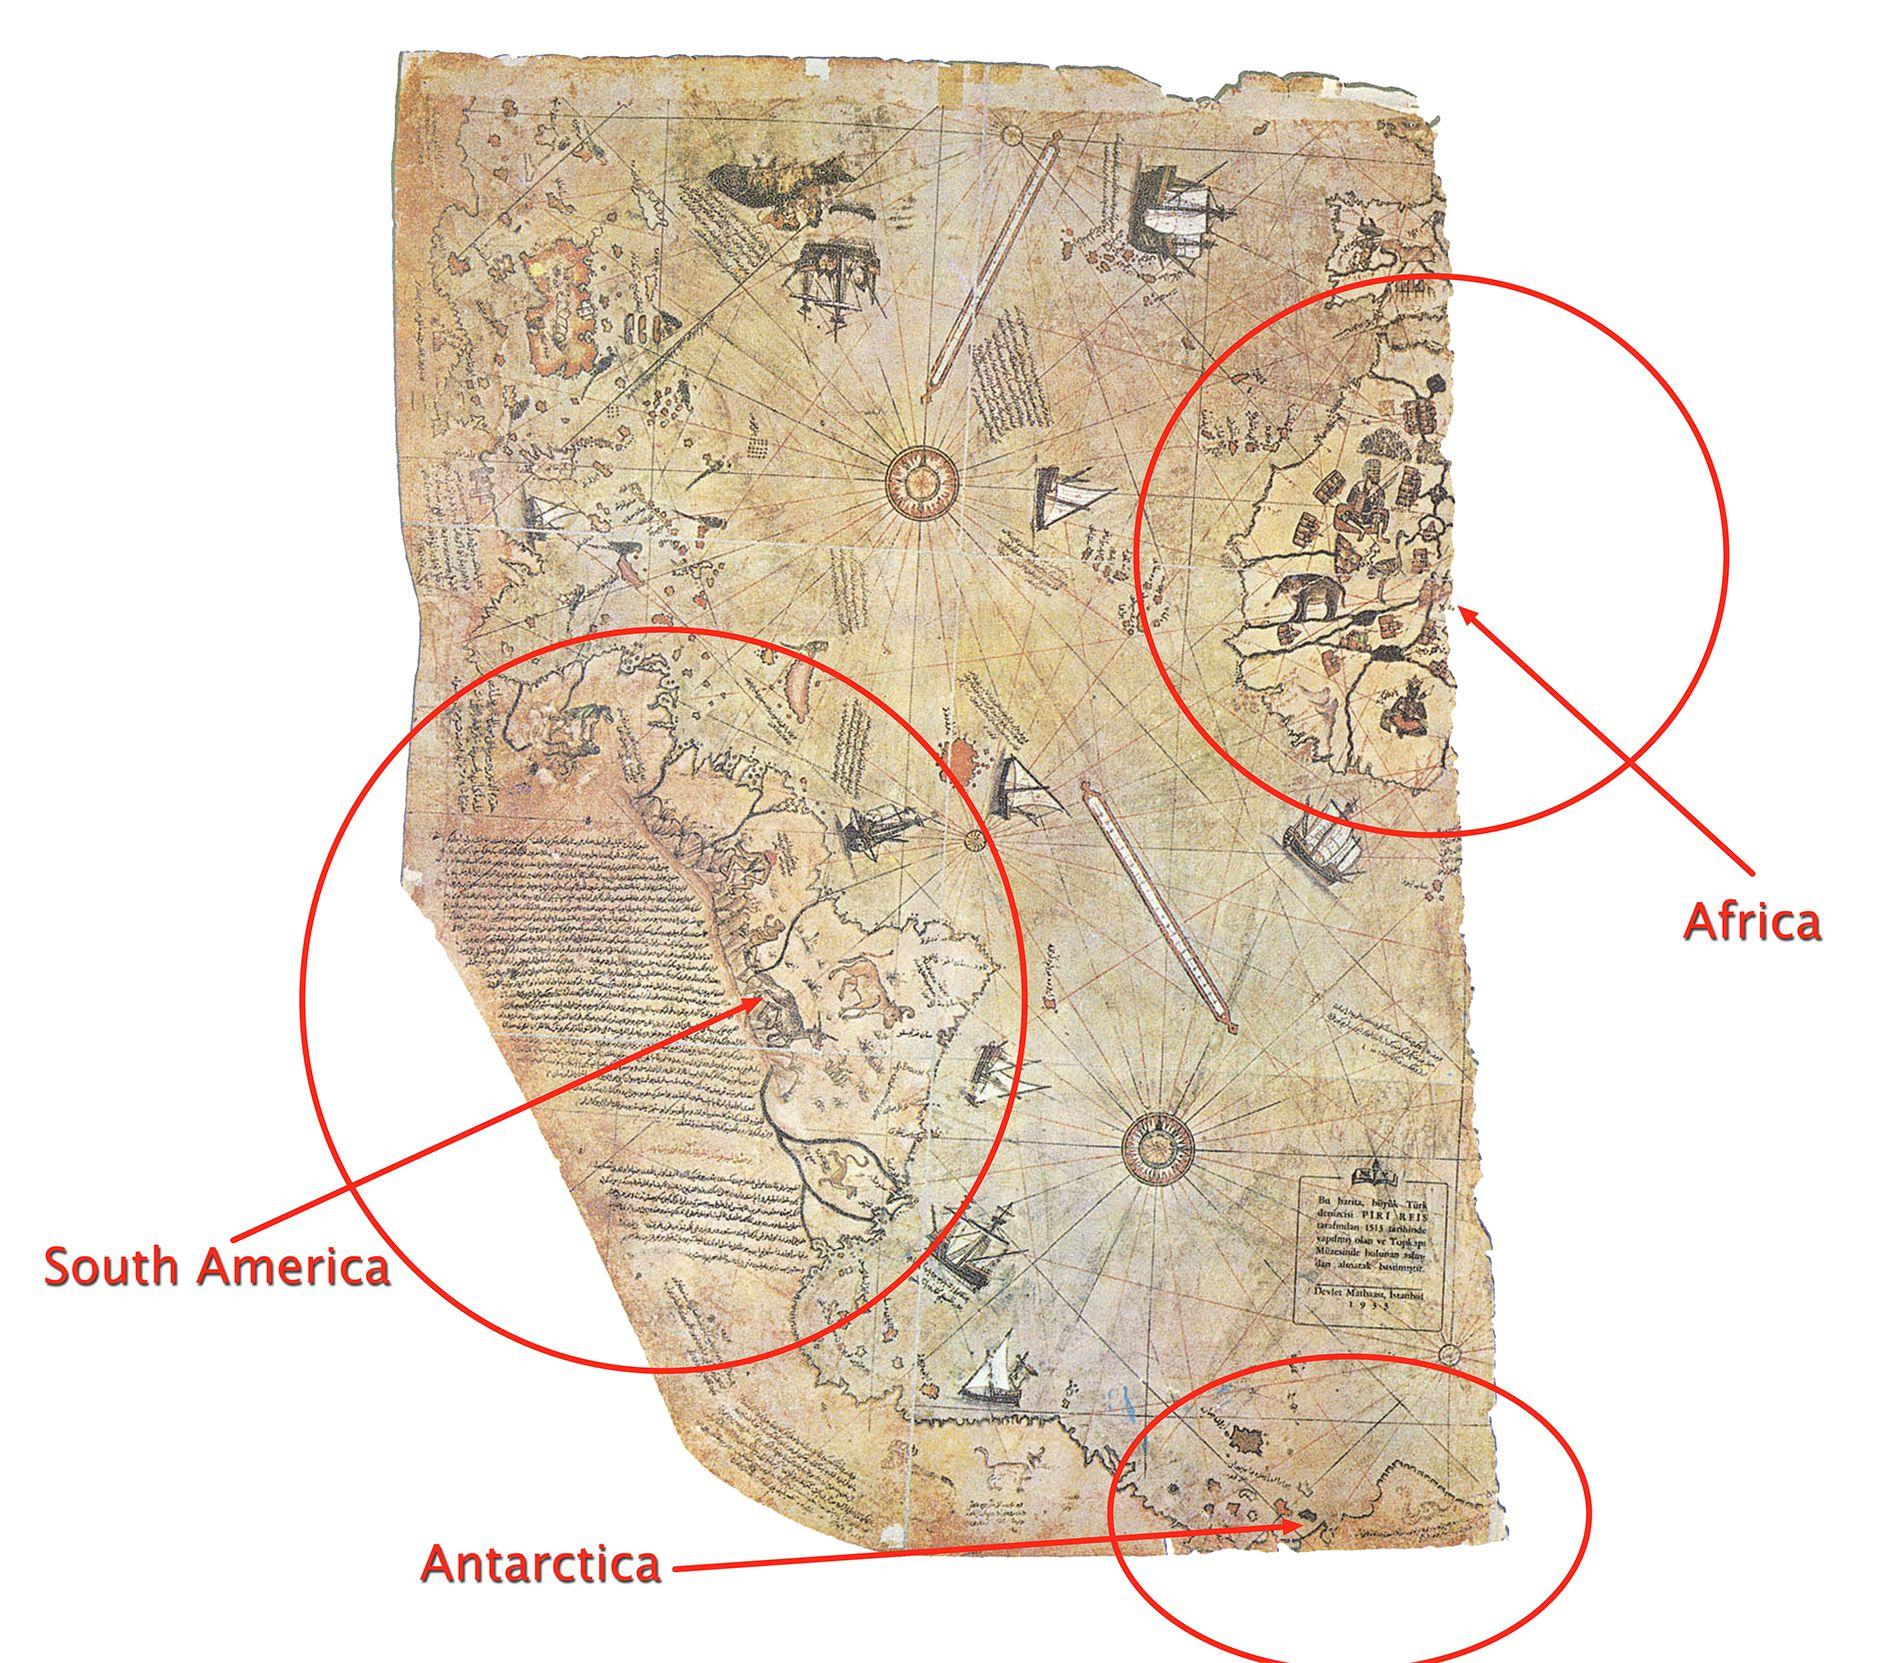 Piri Reis Karte Atlantis.Piri Reis Map Maps Piri Reis Map Atlantis Map